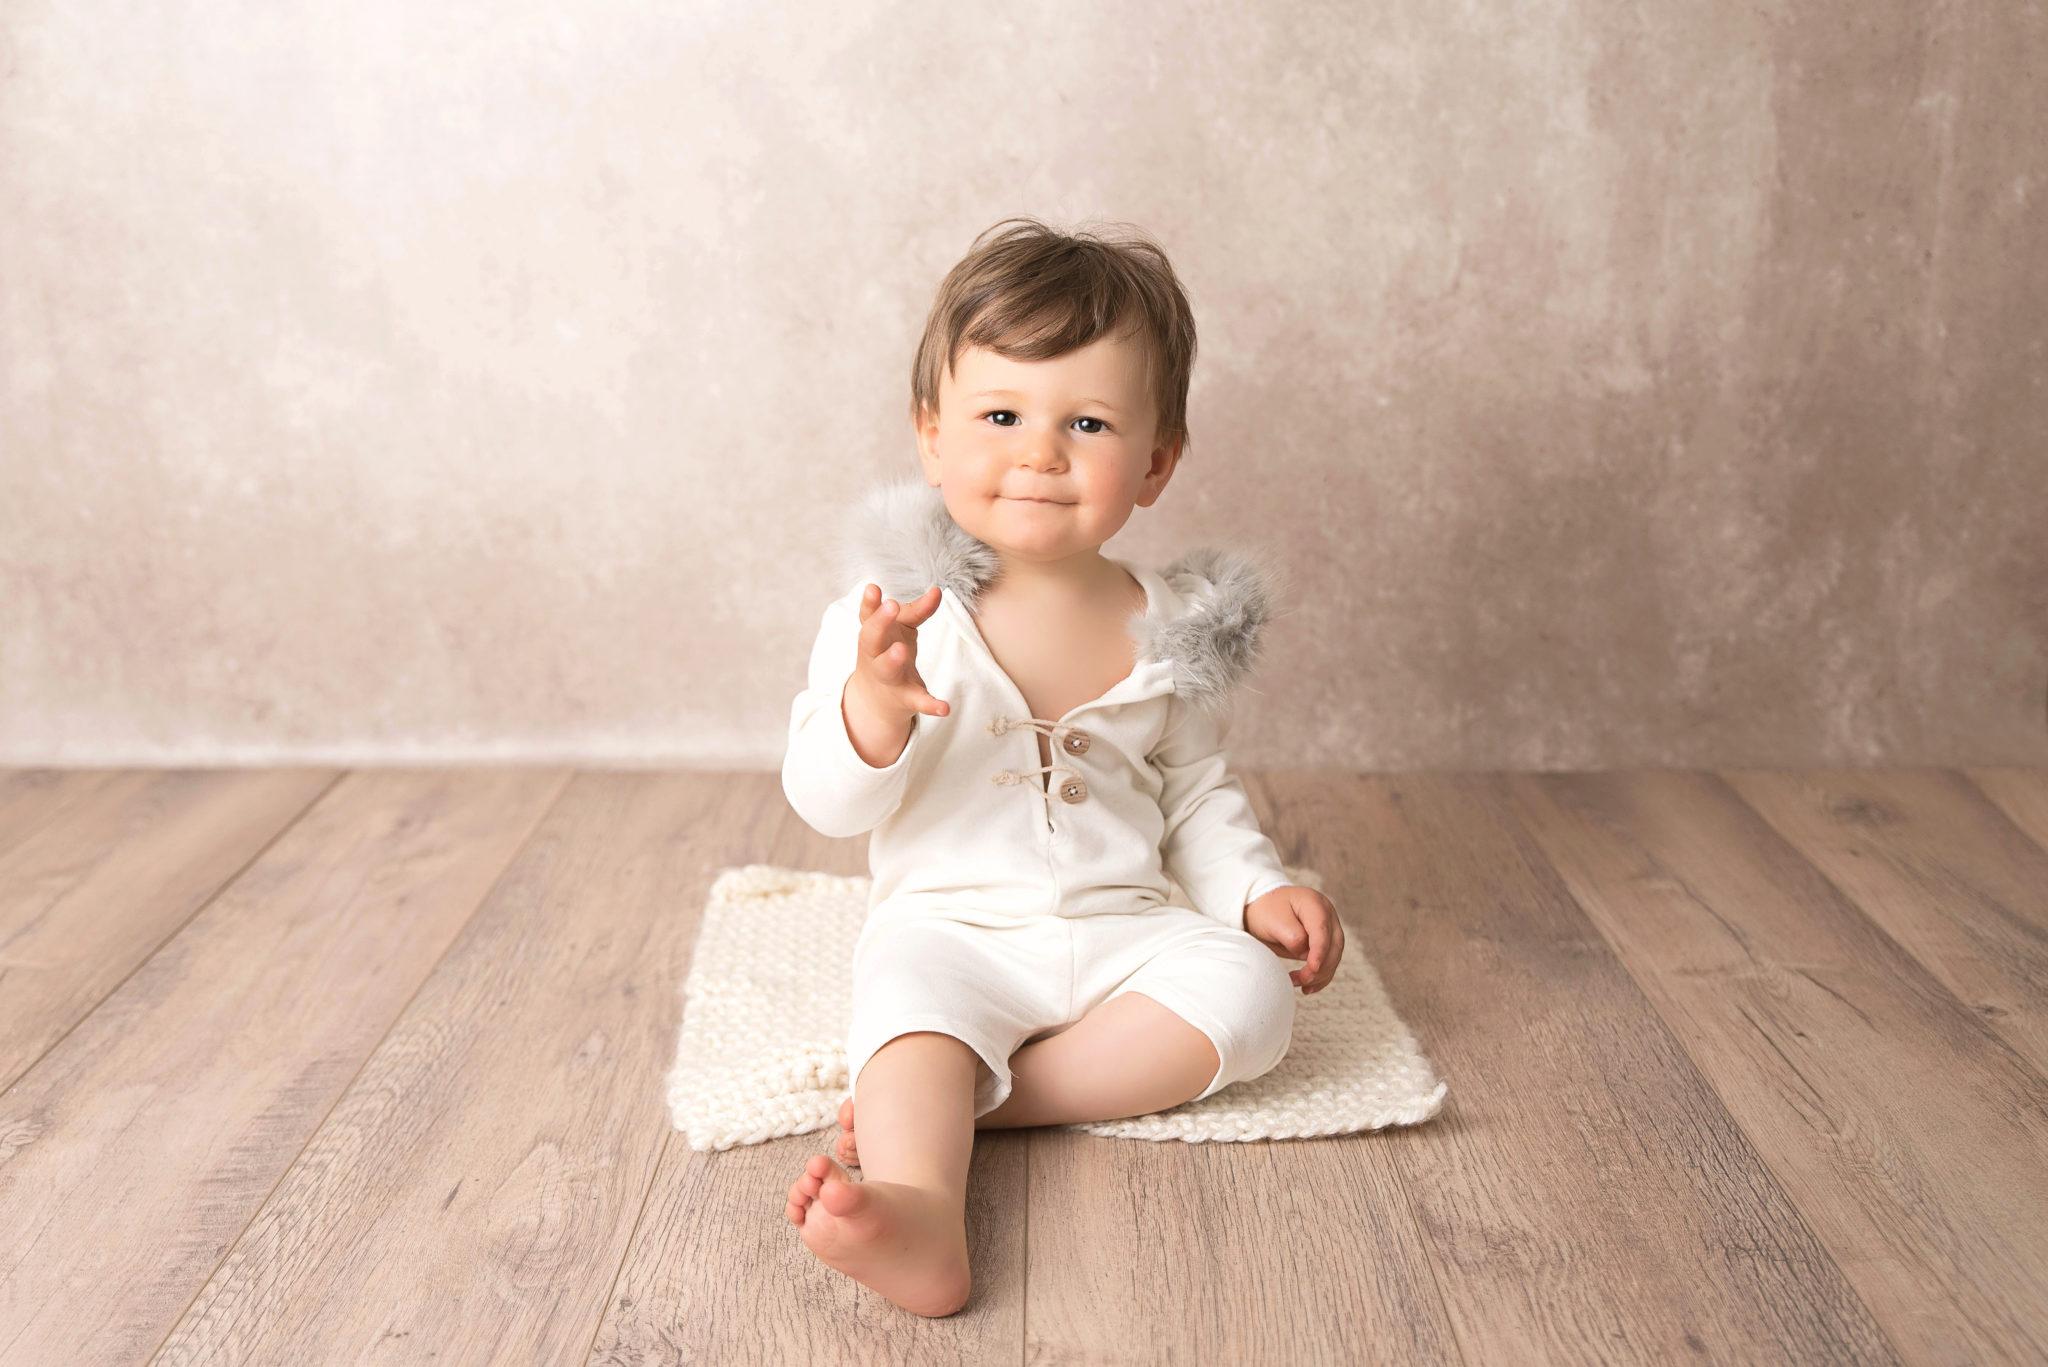 Photographe bébé oise seine et marne val d'oise ainse (38)